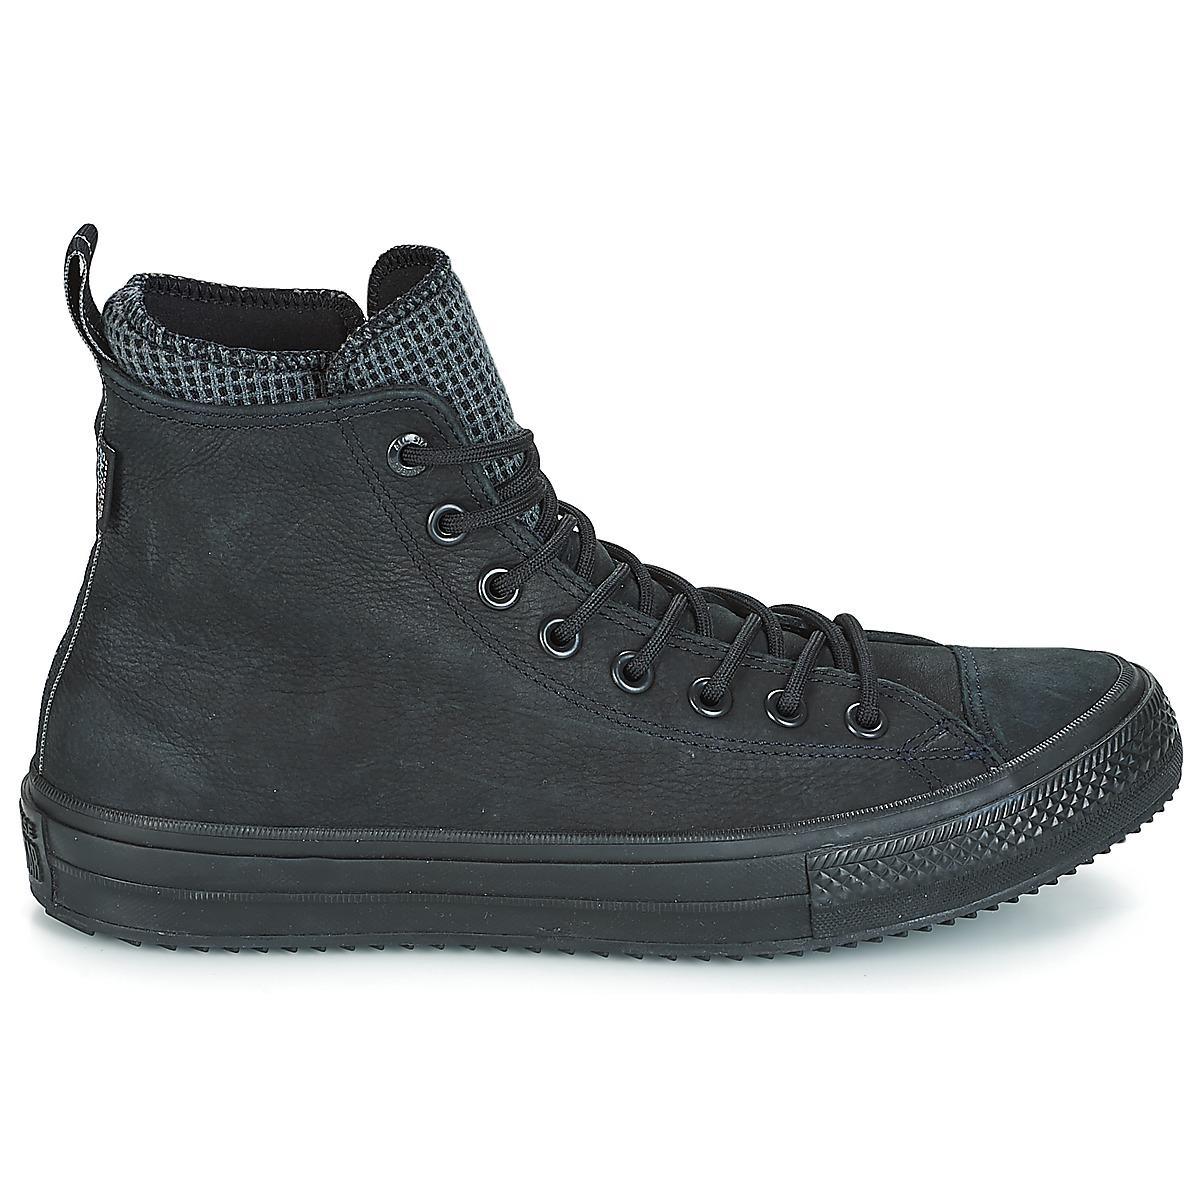 d8906c263bef3e Converse - Black Chuck Taylor All Star Wp Boot Leather Hi Shoes (high-top.  View fullscreen